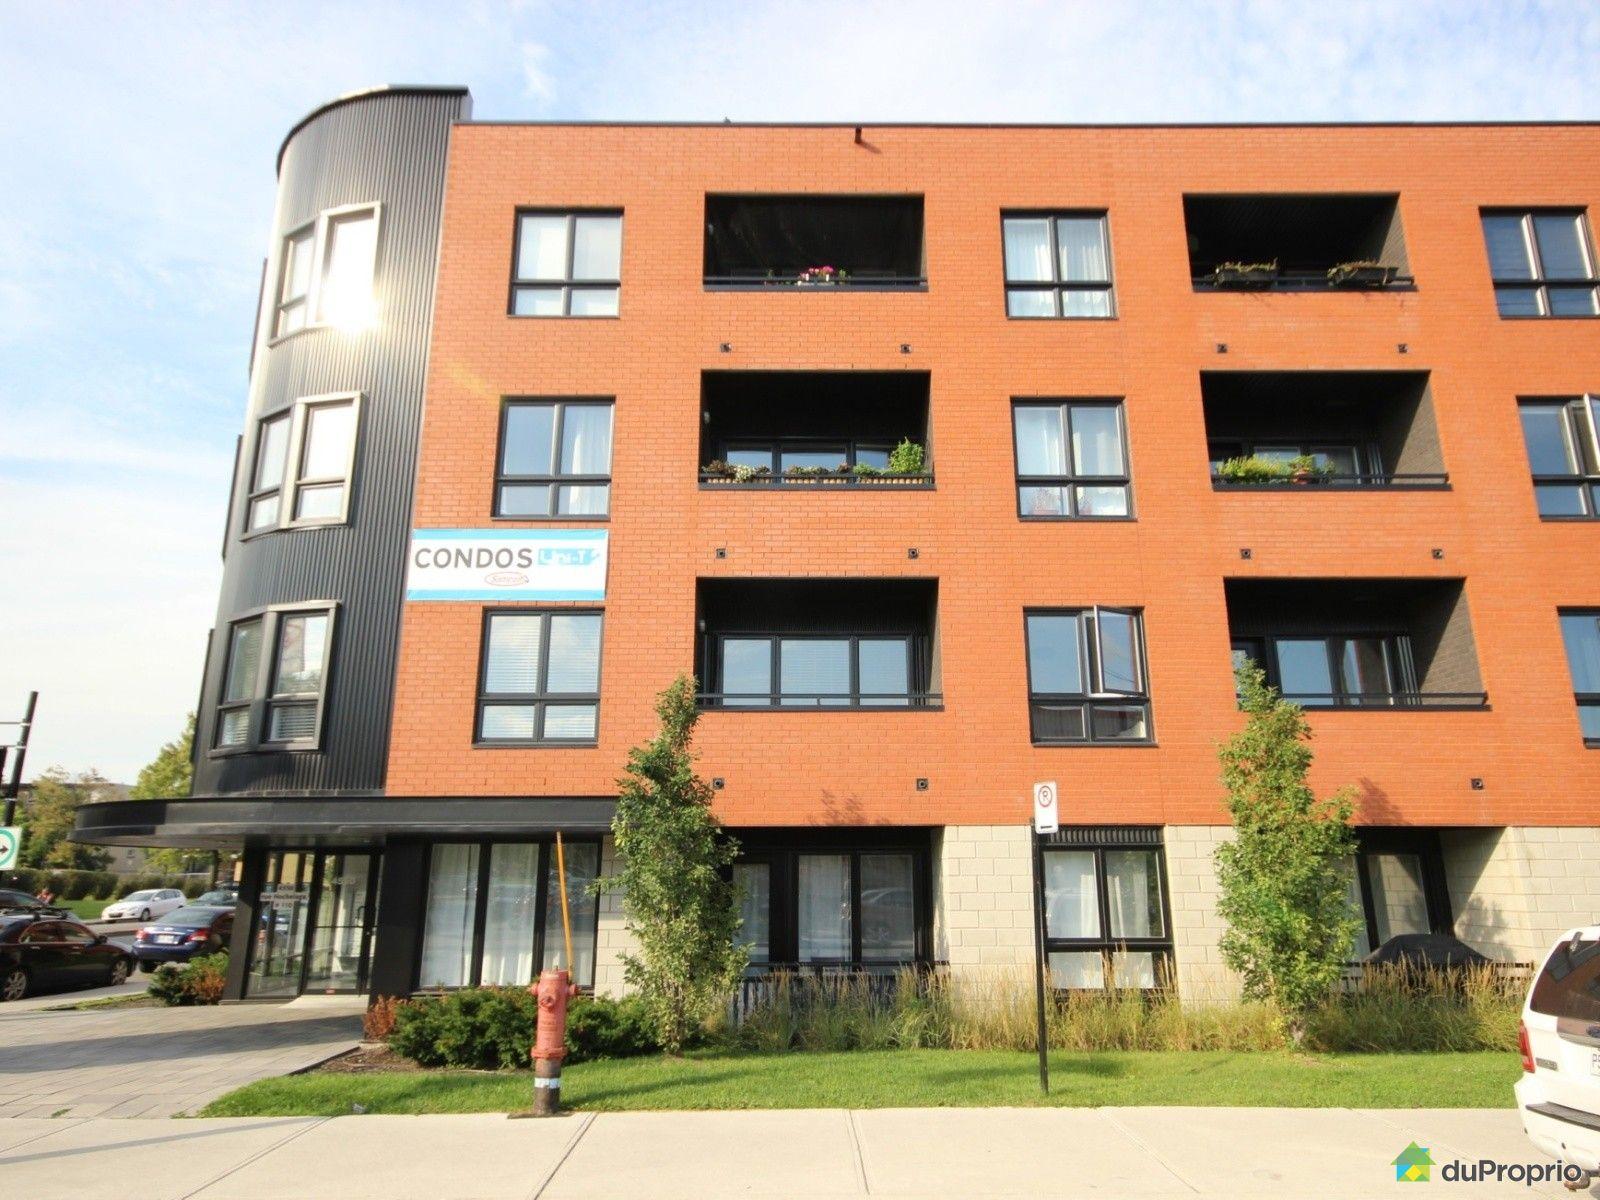 Ultimate Backyard Rink : Condominium for sale Mercier  Hochelaga  Maisonneuve, With parking